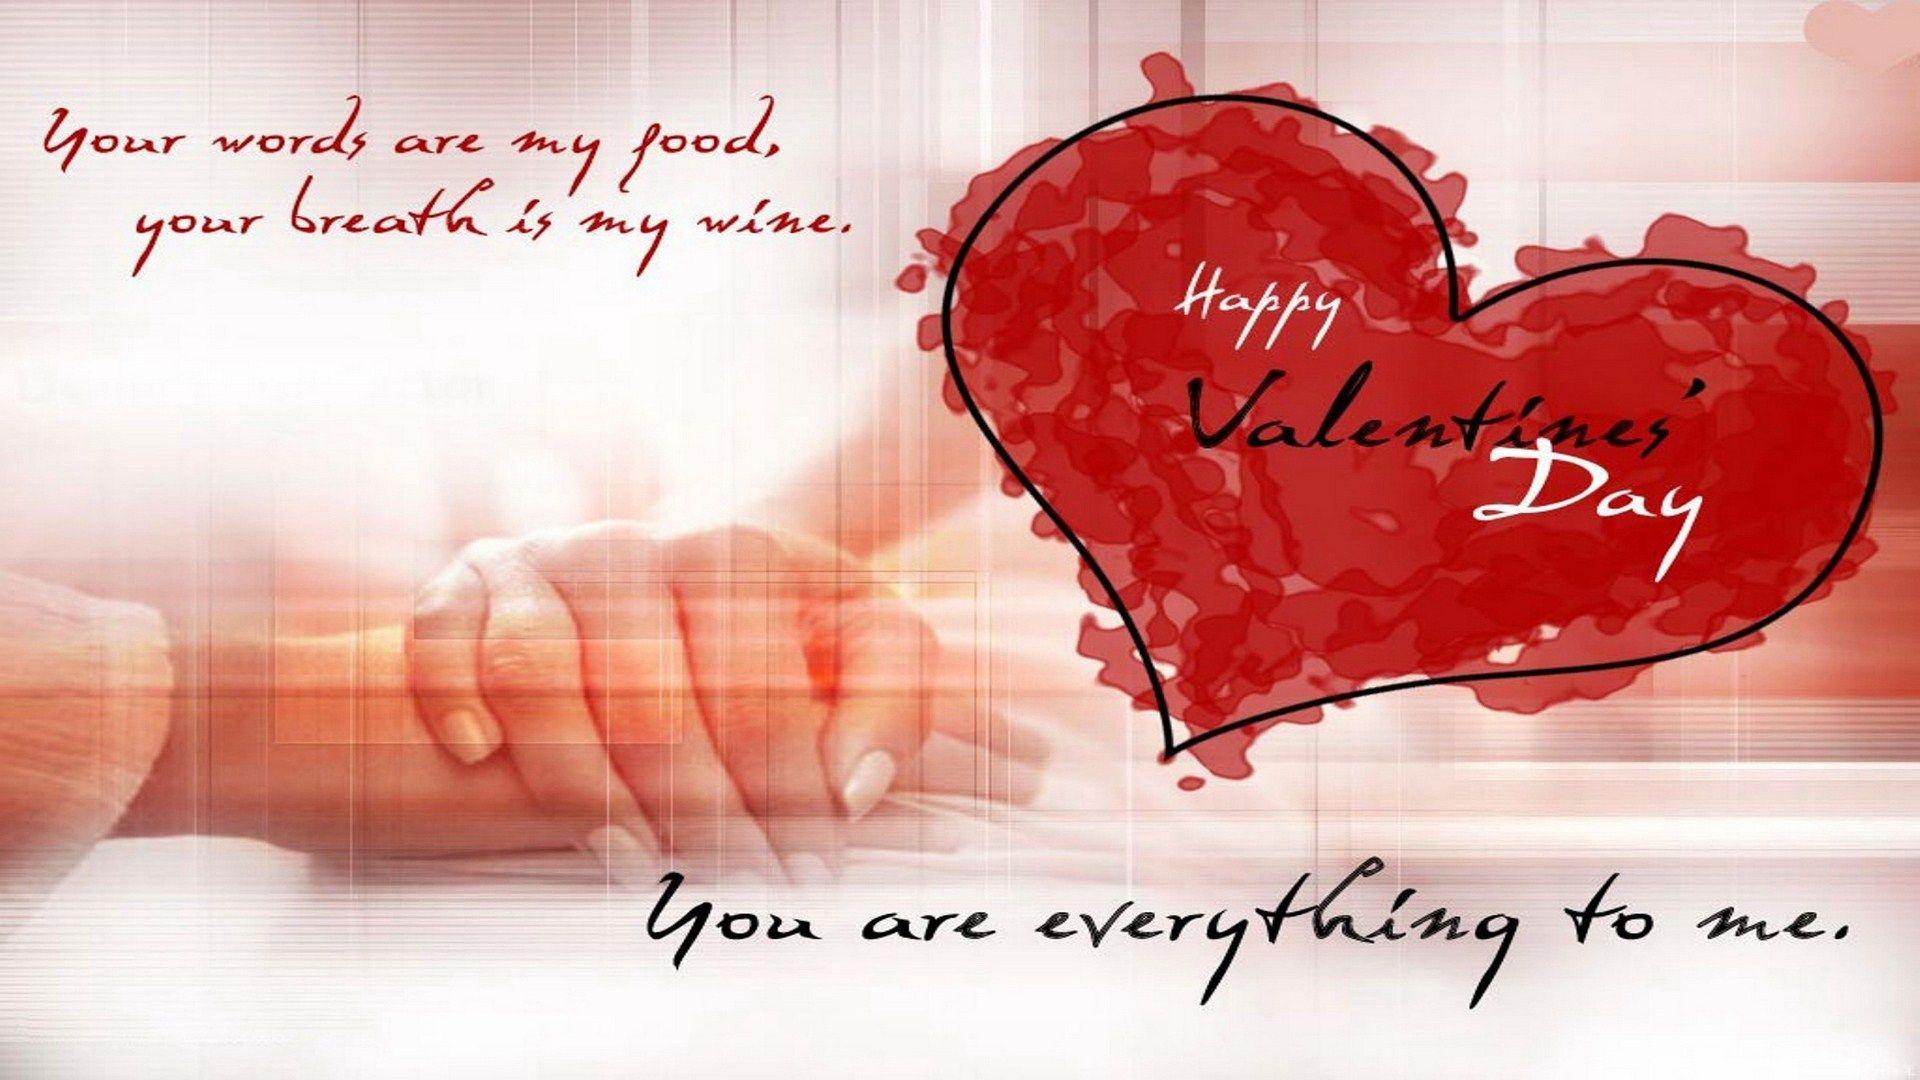 Wallpaper download of love - Love Wallpaper Download